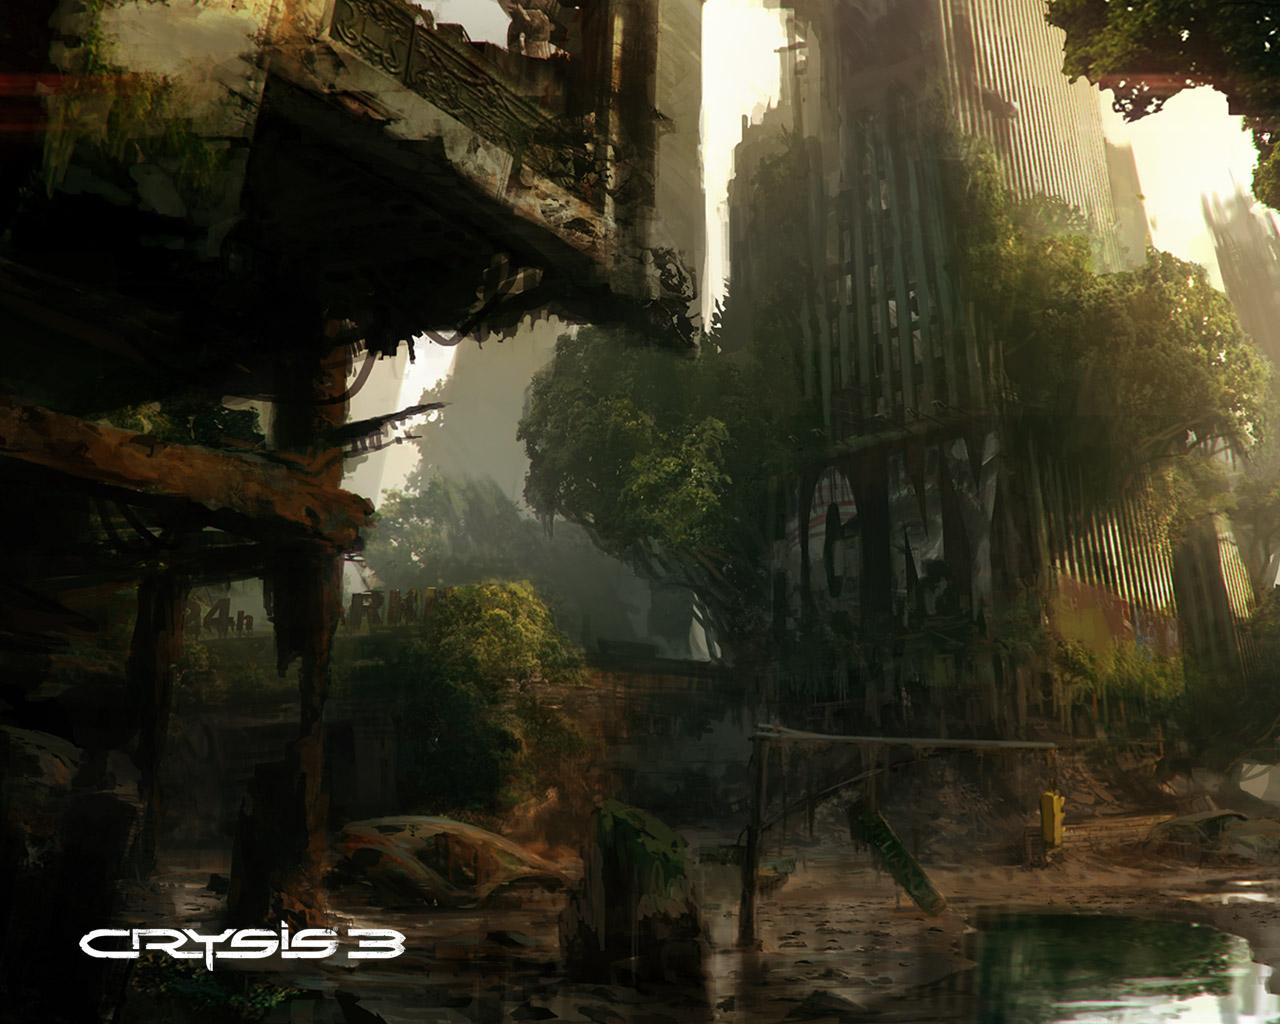 Crysis 3 Wallpaper in 1280x1024